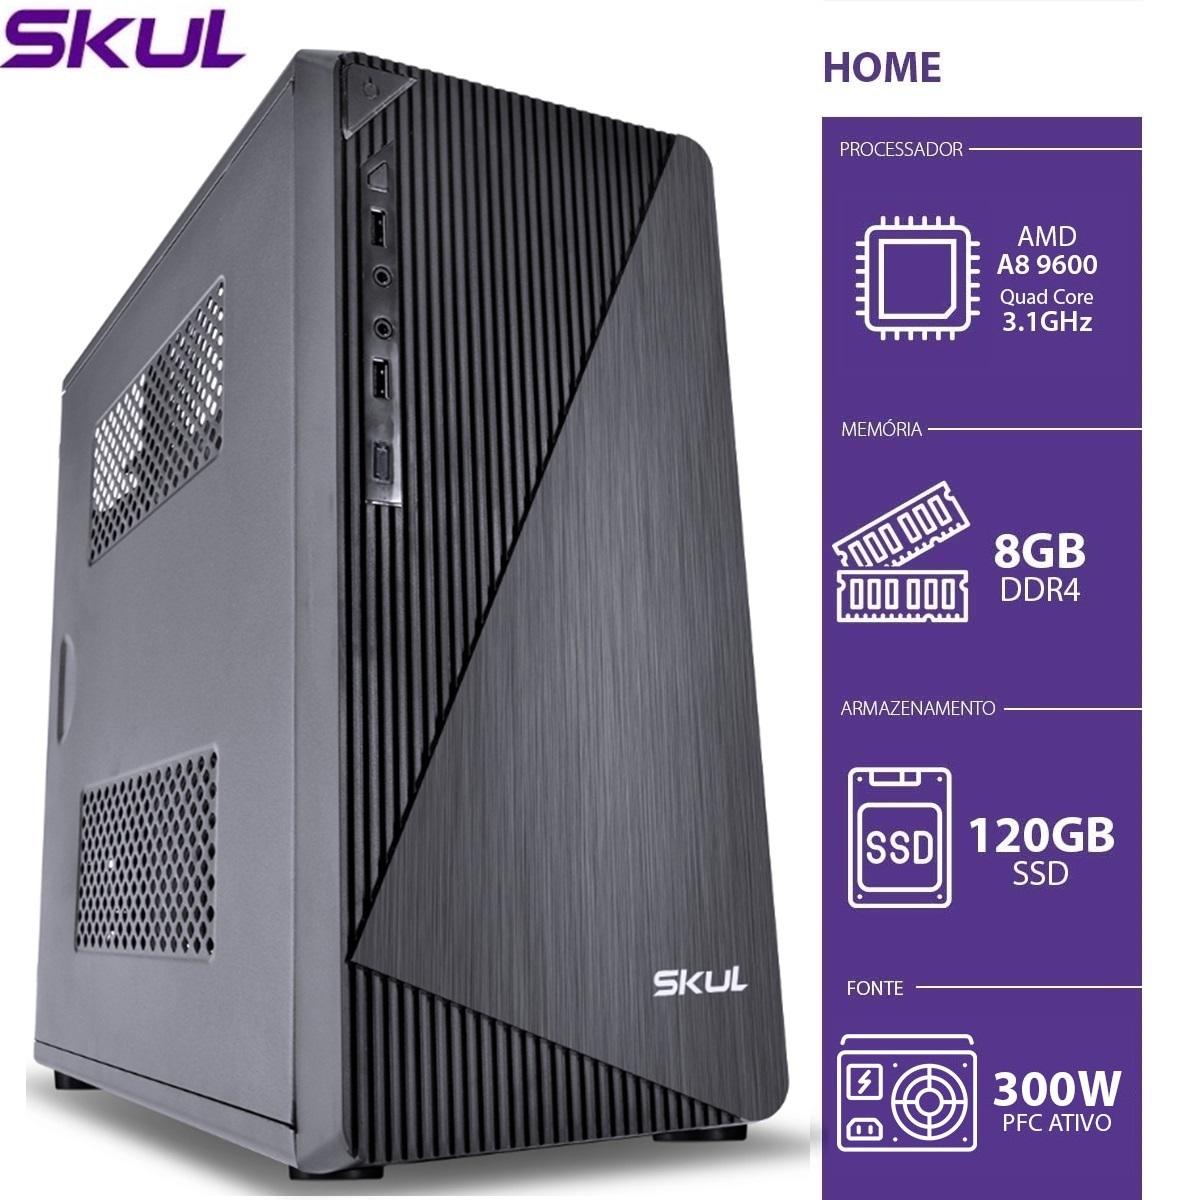 COMPUTADOR HOME H200 - AMD A8 9600 3.1GHZ 8GB DDR4 SSD 120GB HDMI/VGA FONTE 300W  - Audio Video & cia